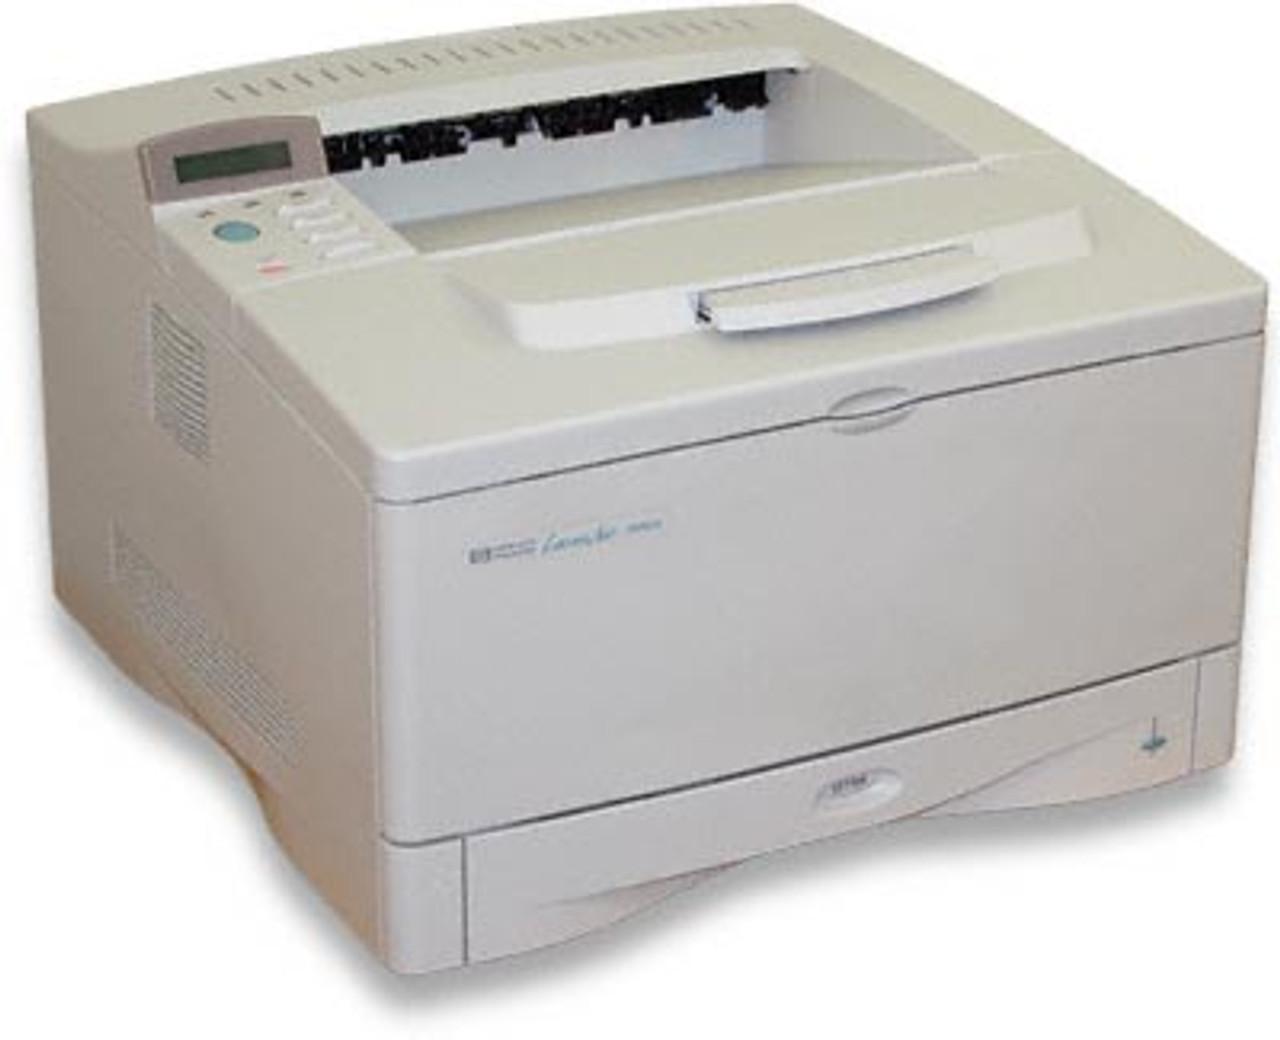 HP LaserJet 5100 - Q1860A - HP 11x17 Laser Printer for sale